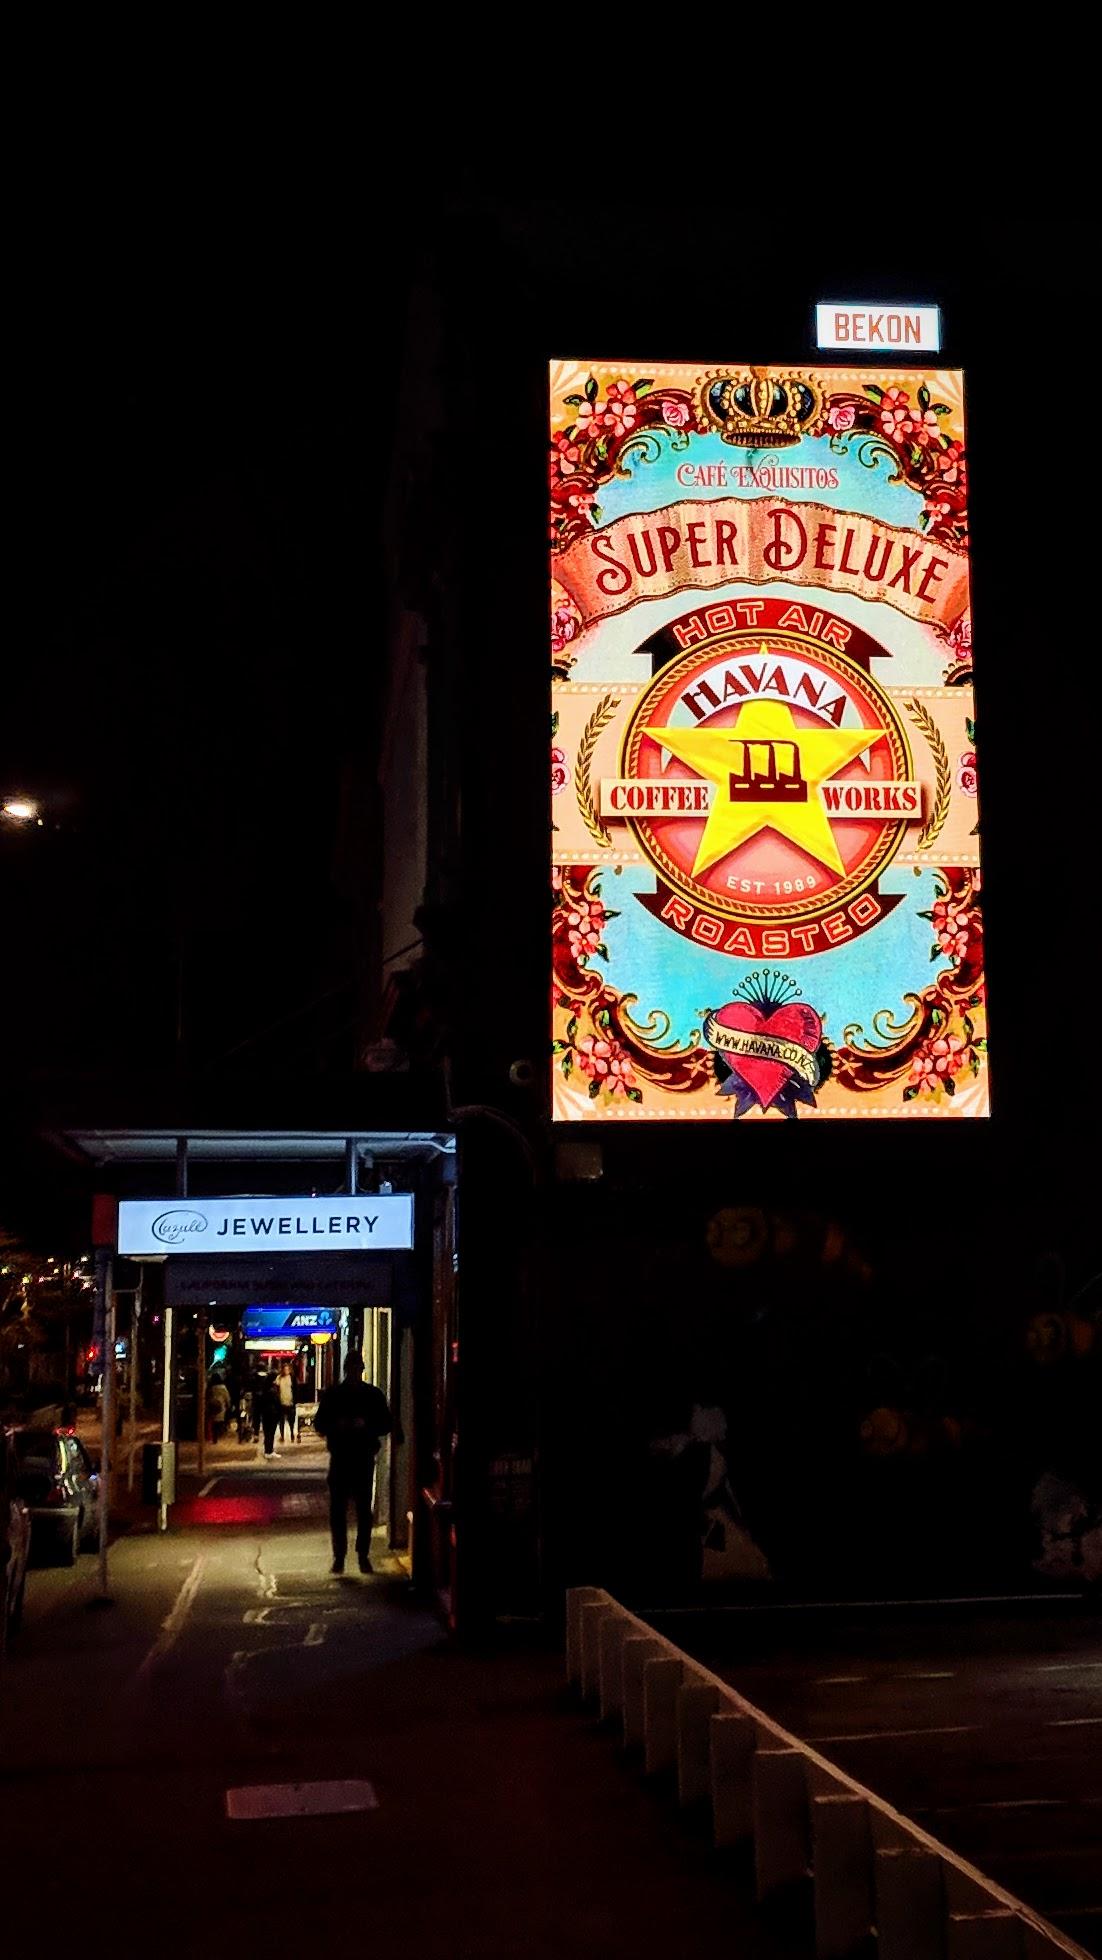 Cuba Street evening signage